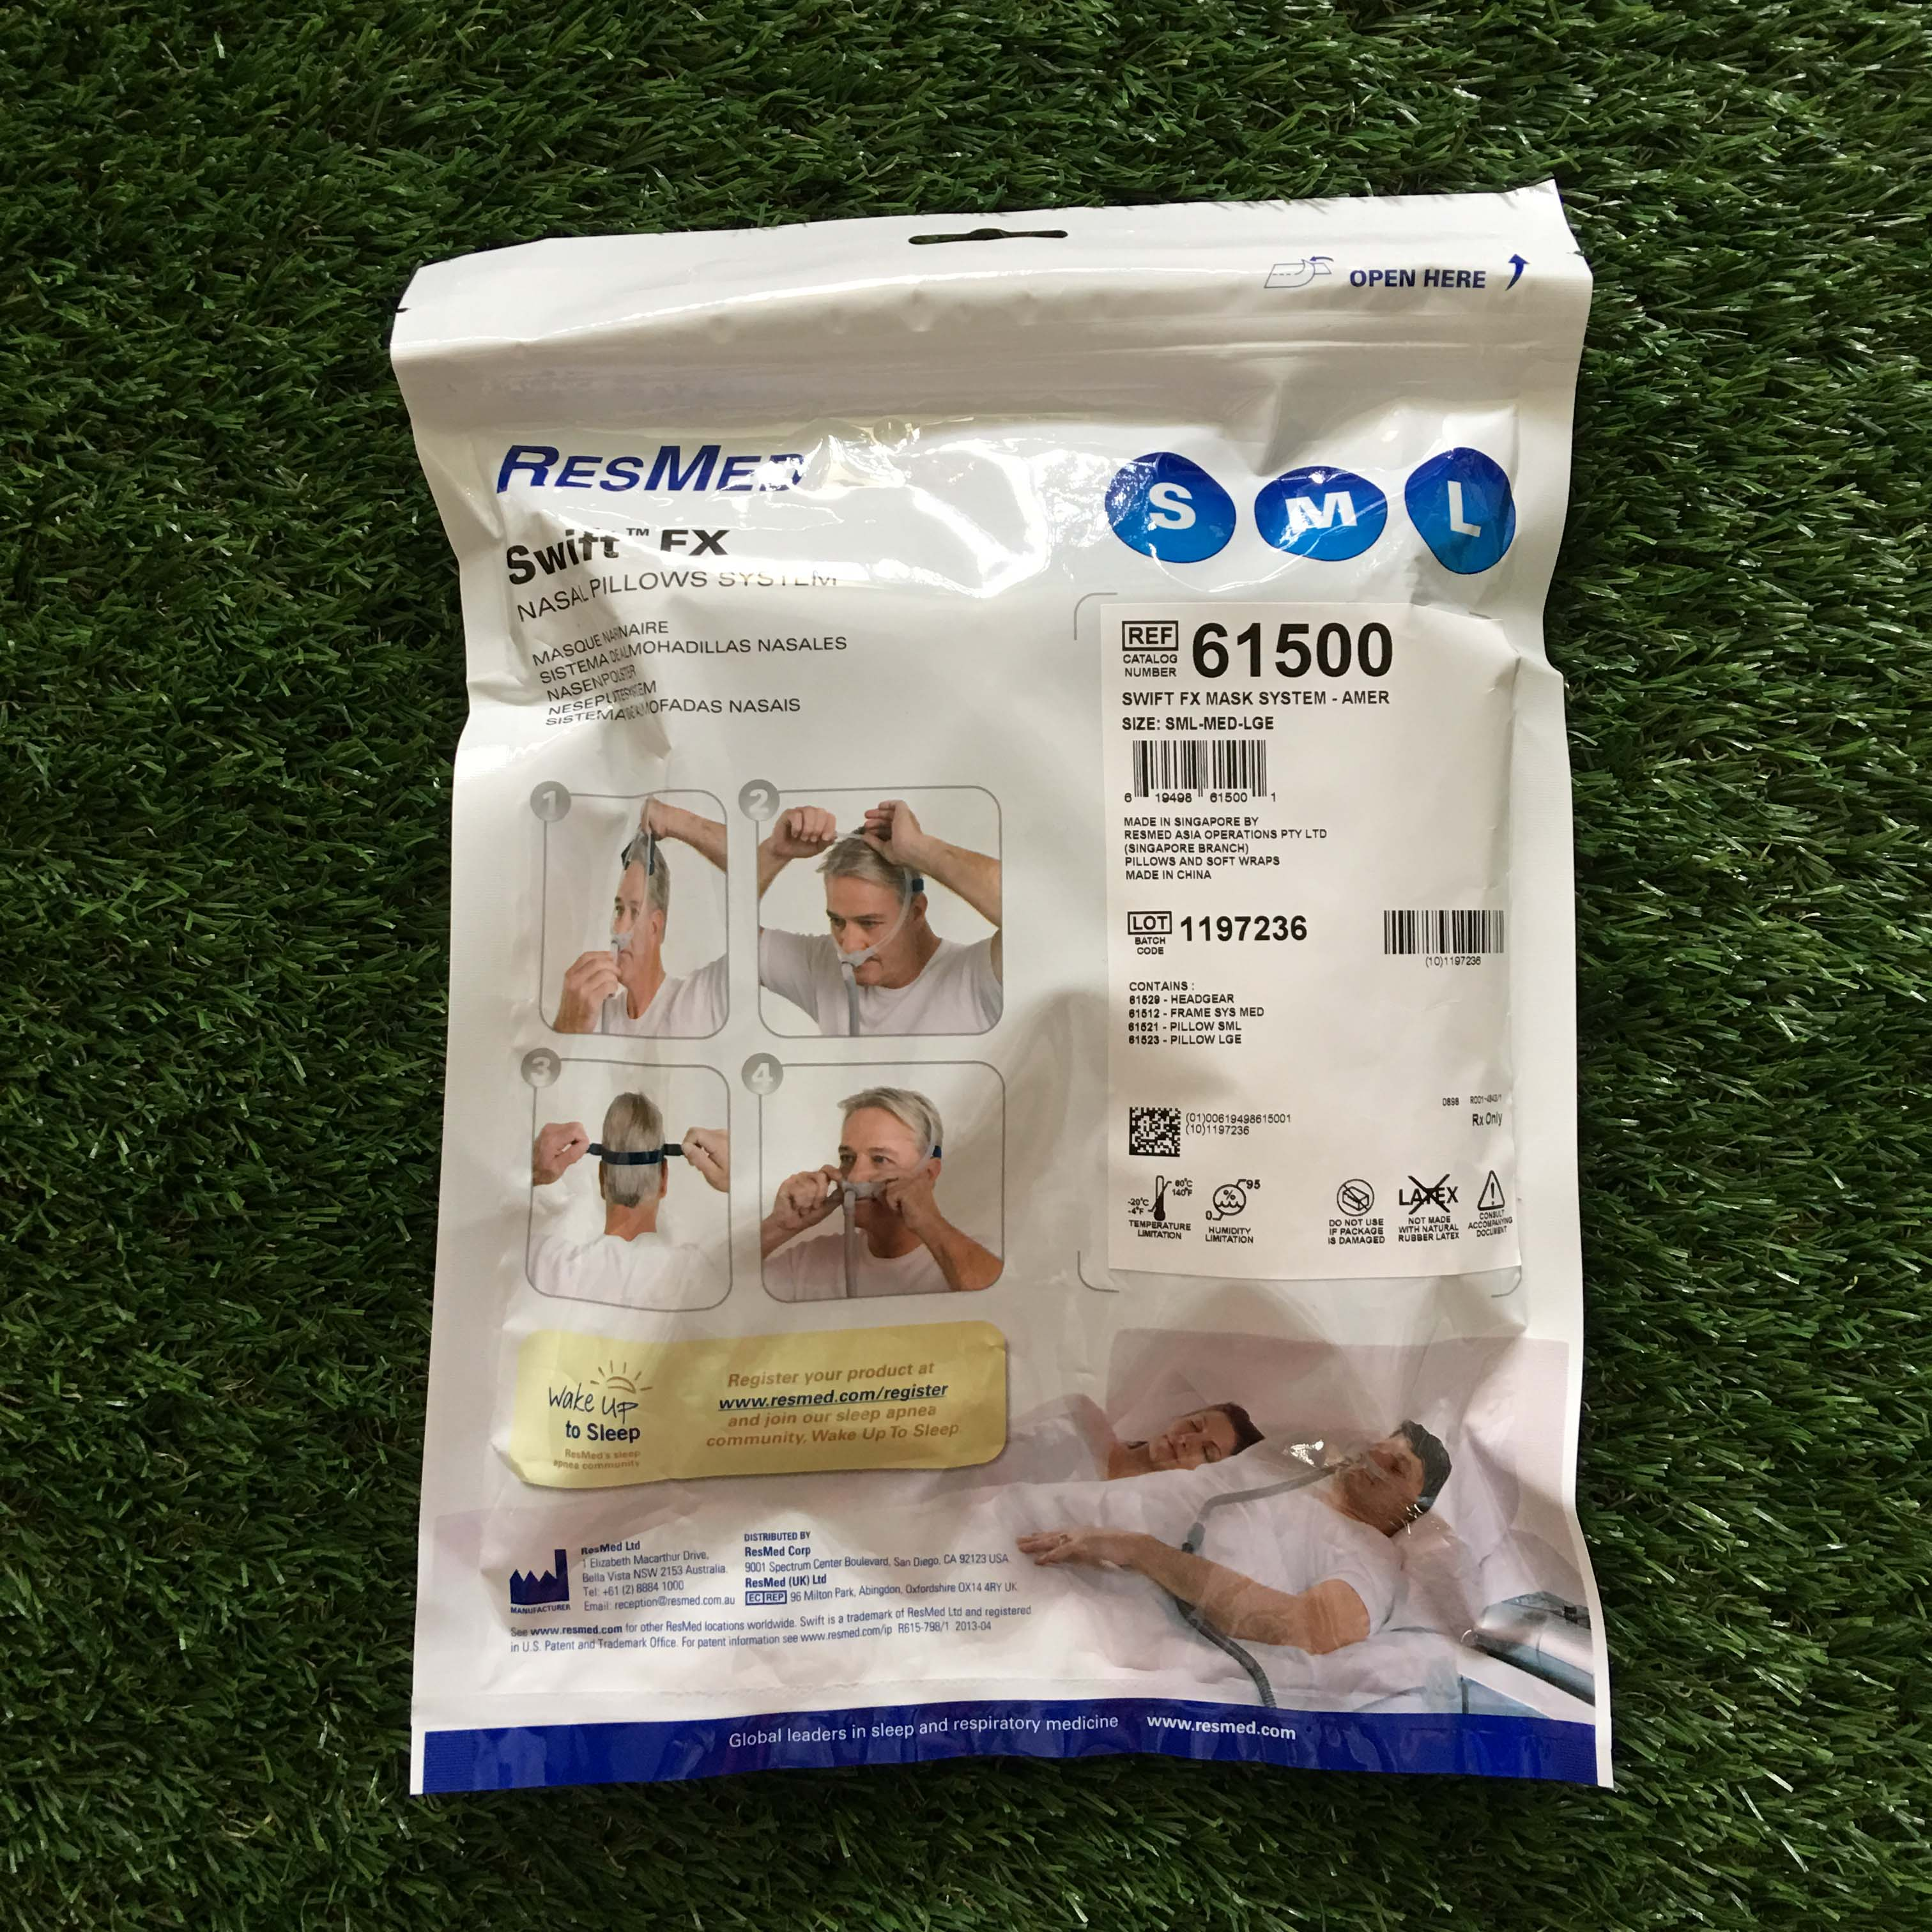 BRAND NEW ResMed Nasal Pillow Mask